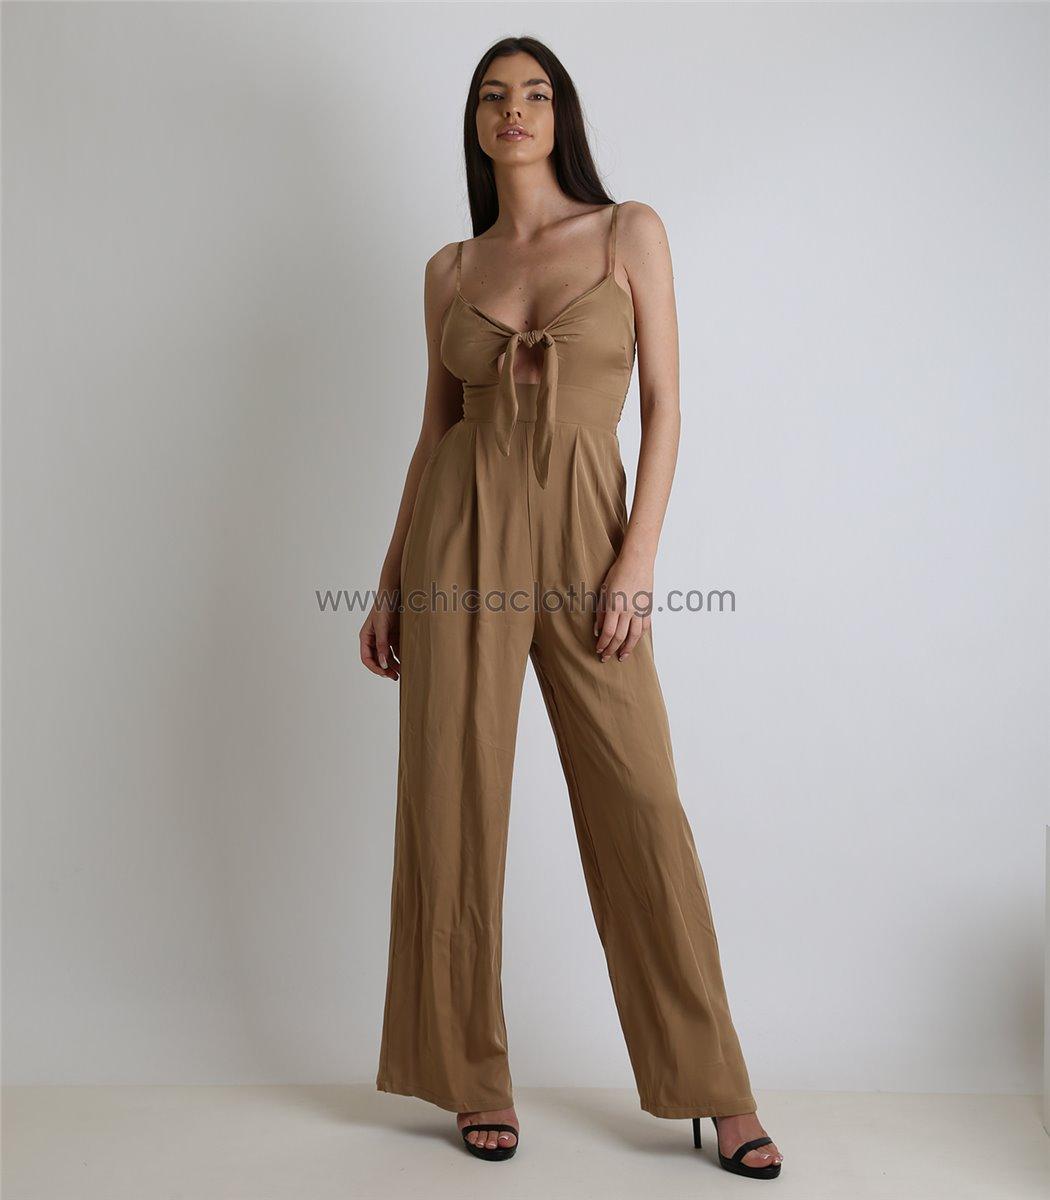 79c8ee028497 Γυναικεία ολόσωμη φόρμα με δέσιμο στο στήθος και επένδυση (Μπεζ)